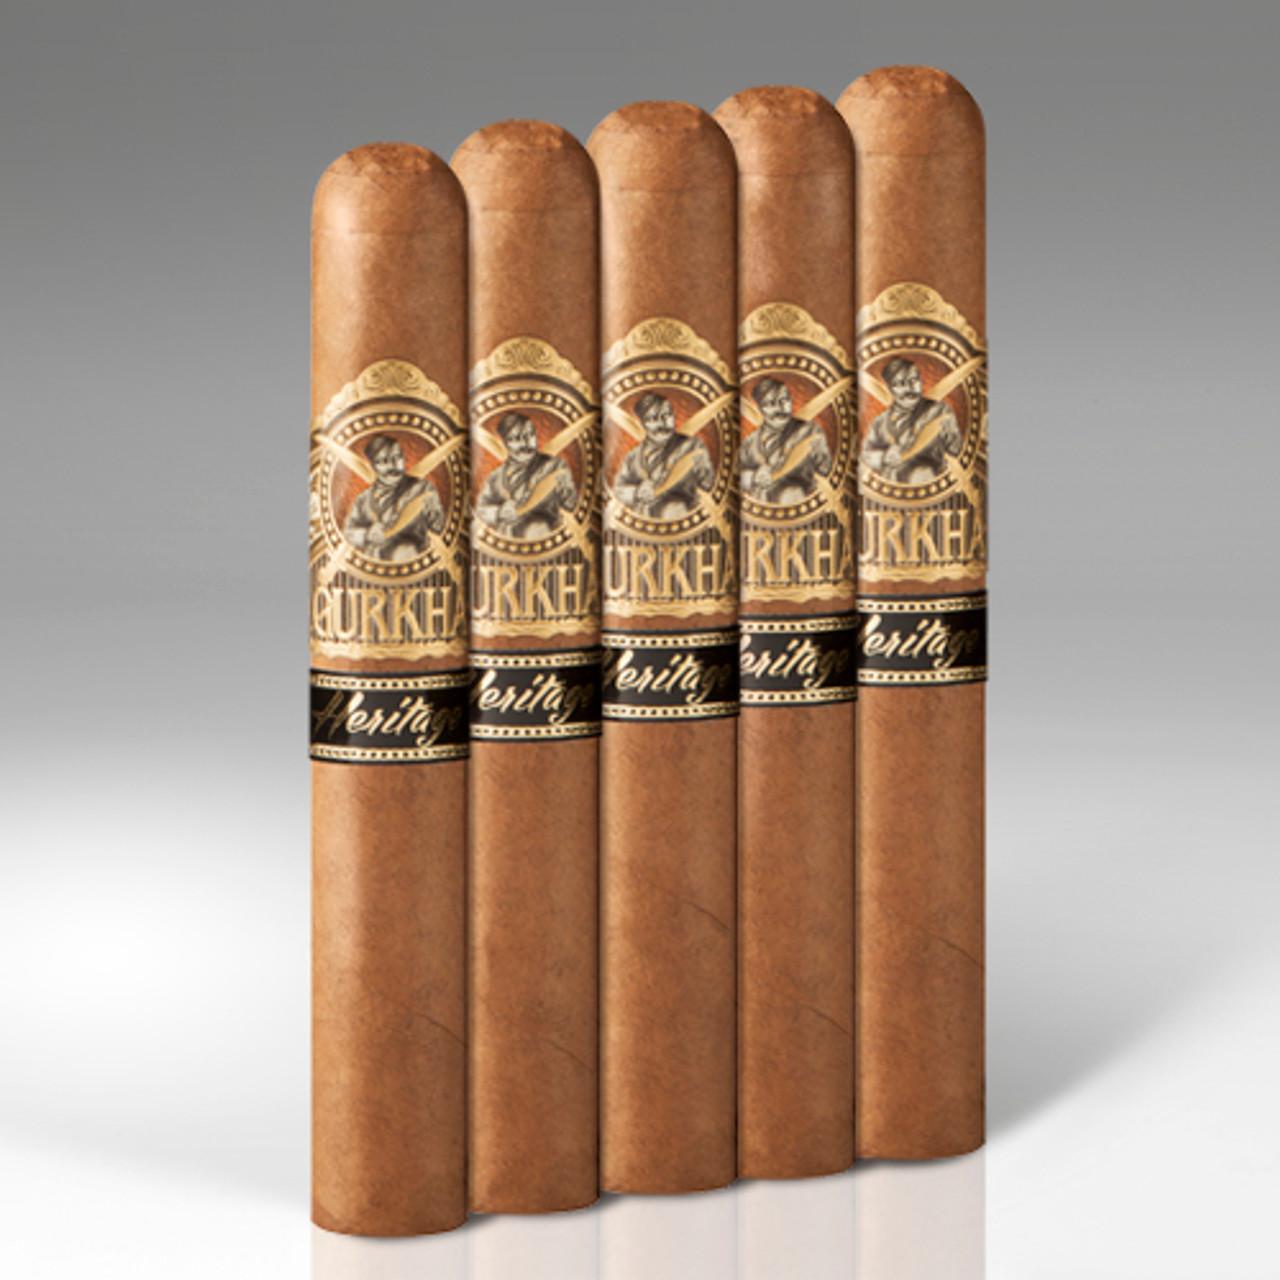 Gurkha 5-Packs Heritage XO Cigars - 6 x 60 (Pack of 5)